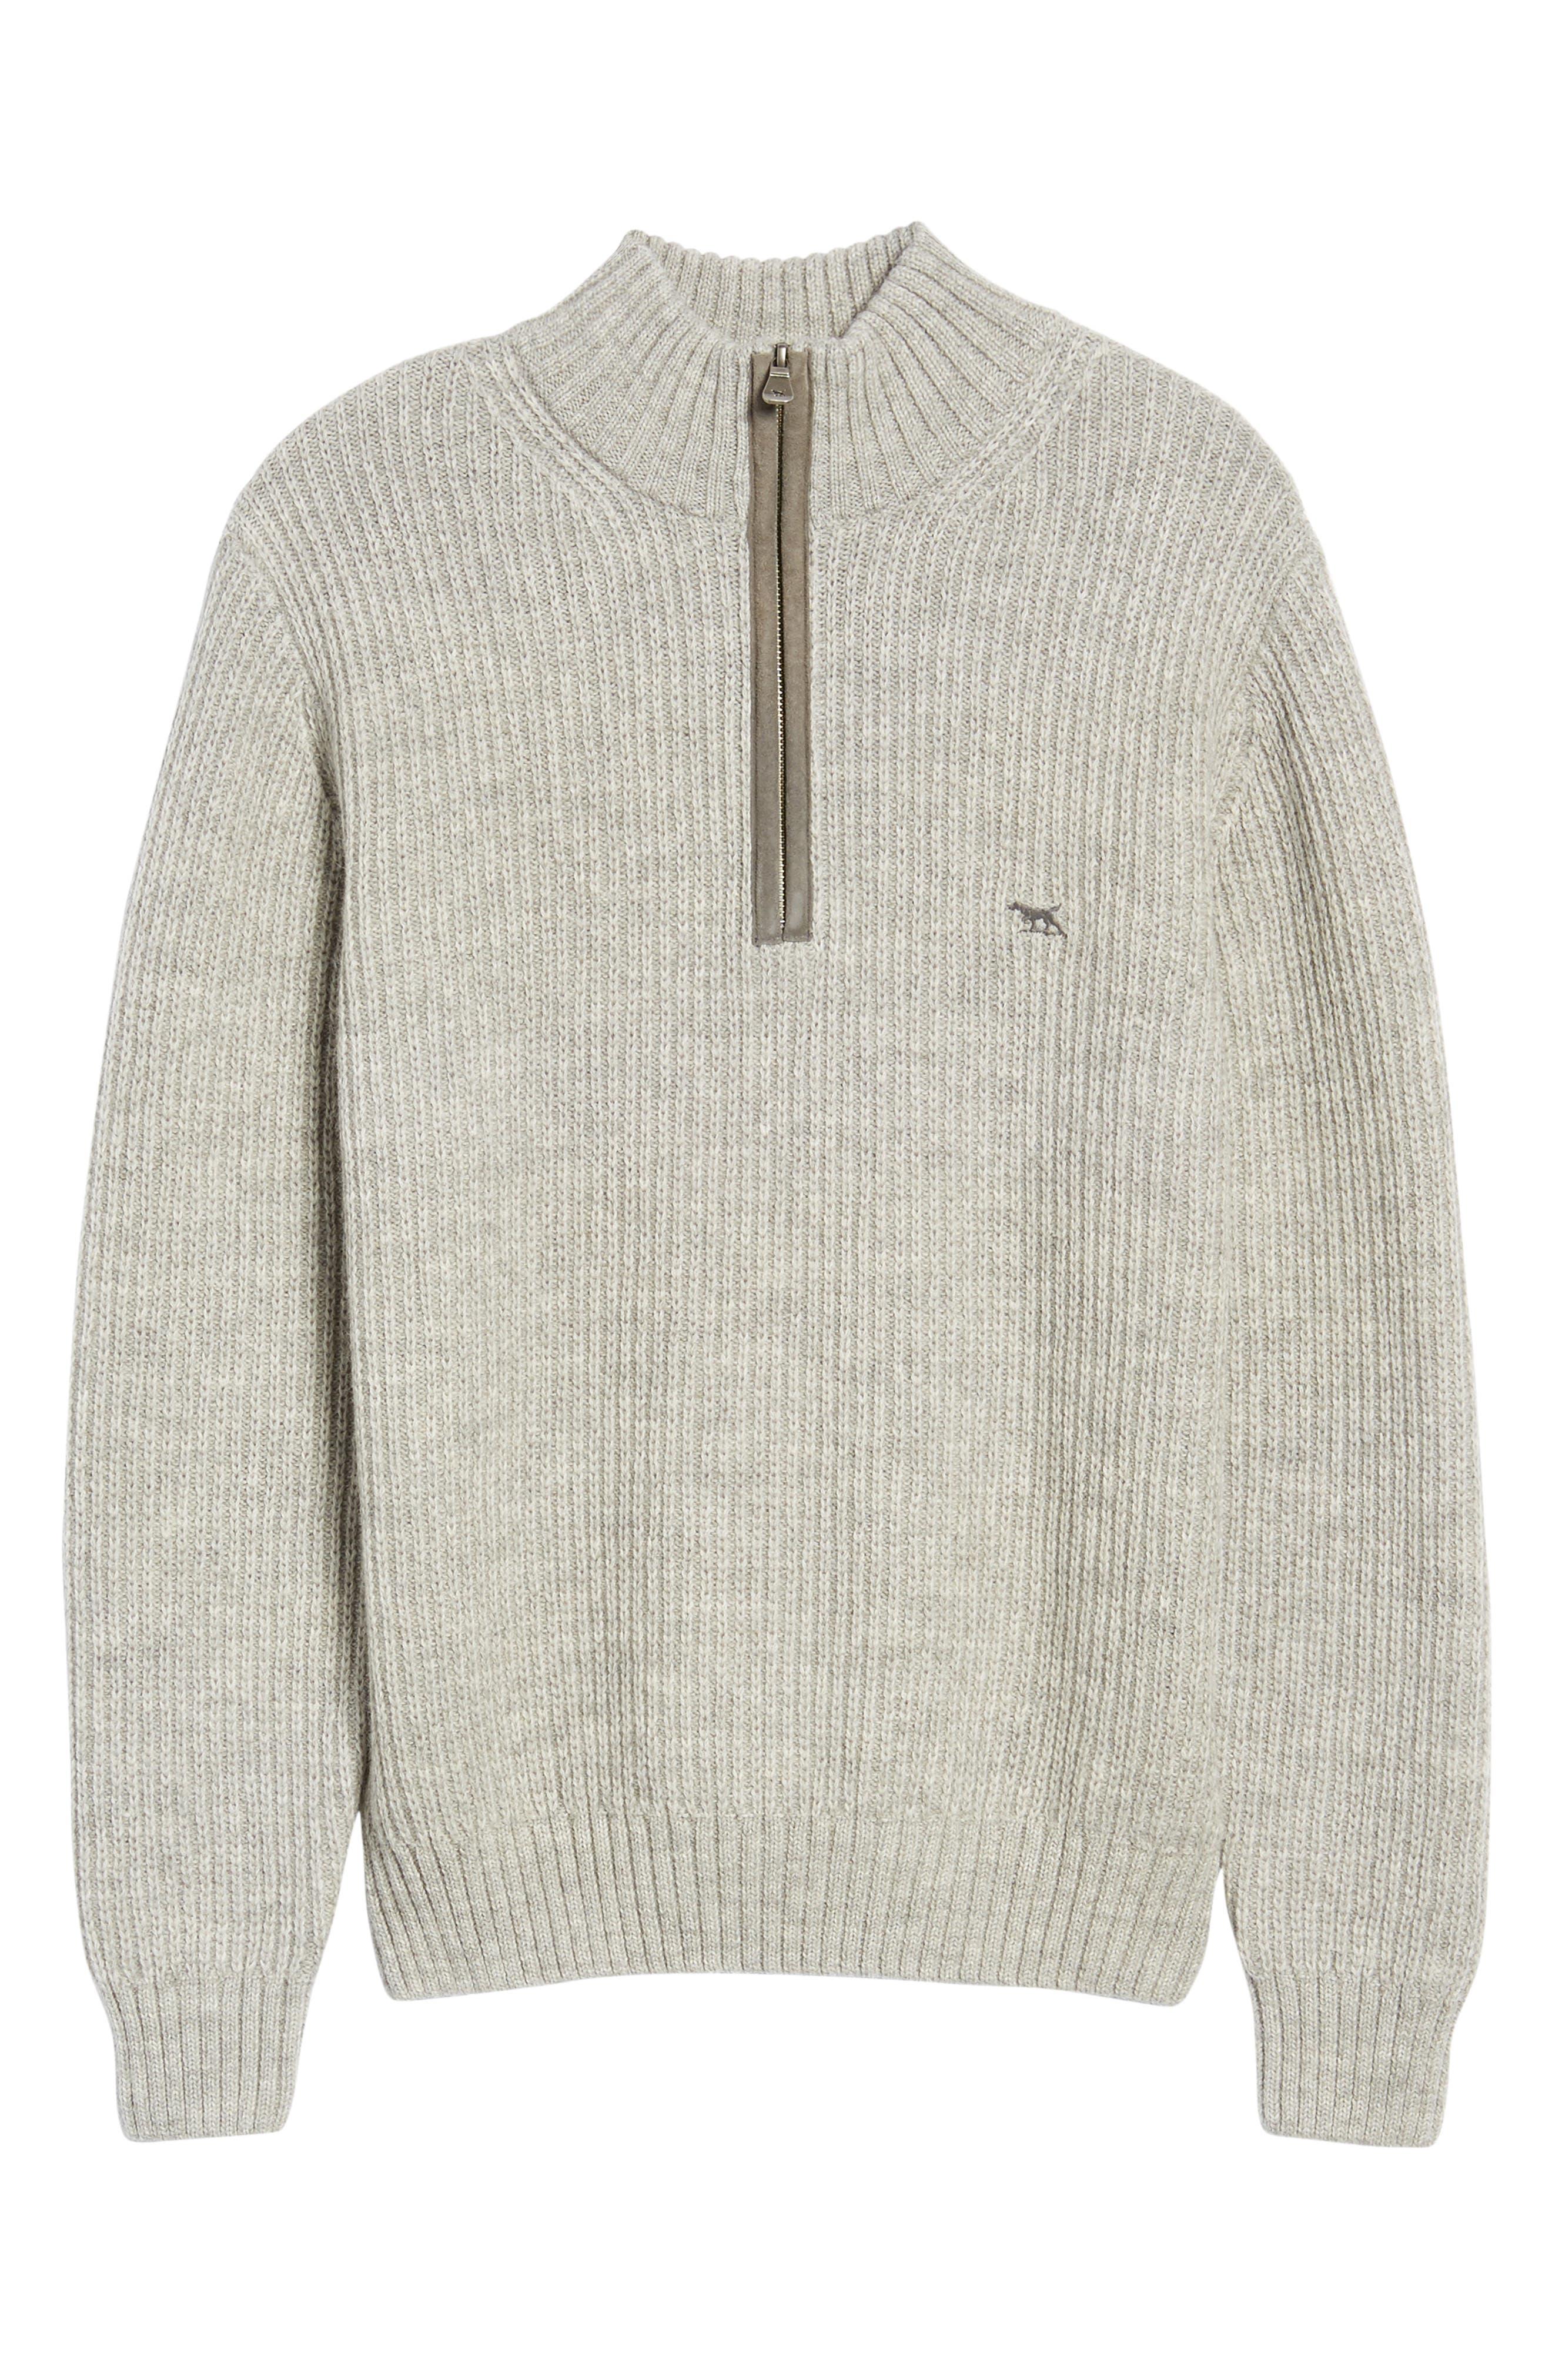 'Huka Lodge' Merino Wool Blend Quarter Zip Sweater,                             Alternate thumbnail 6, color,                             268